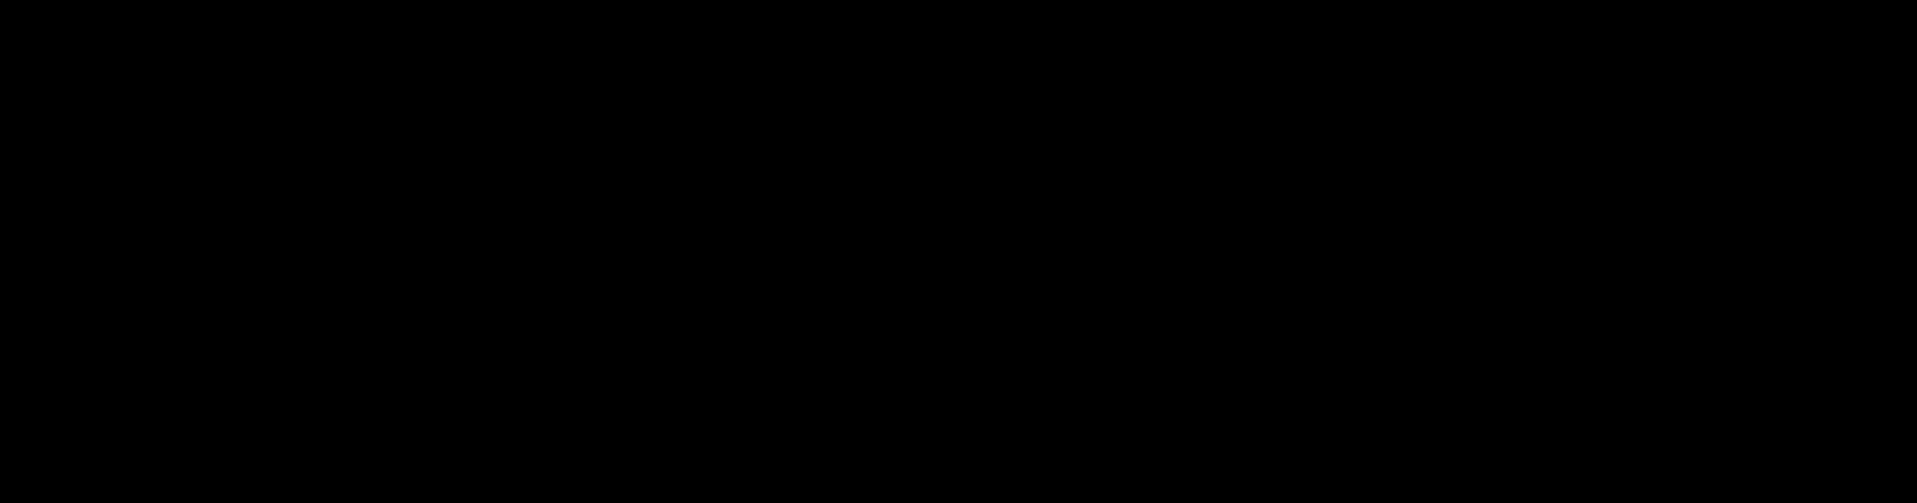 ESTHERGRUP